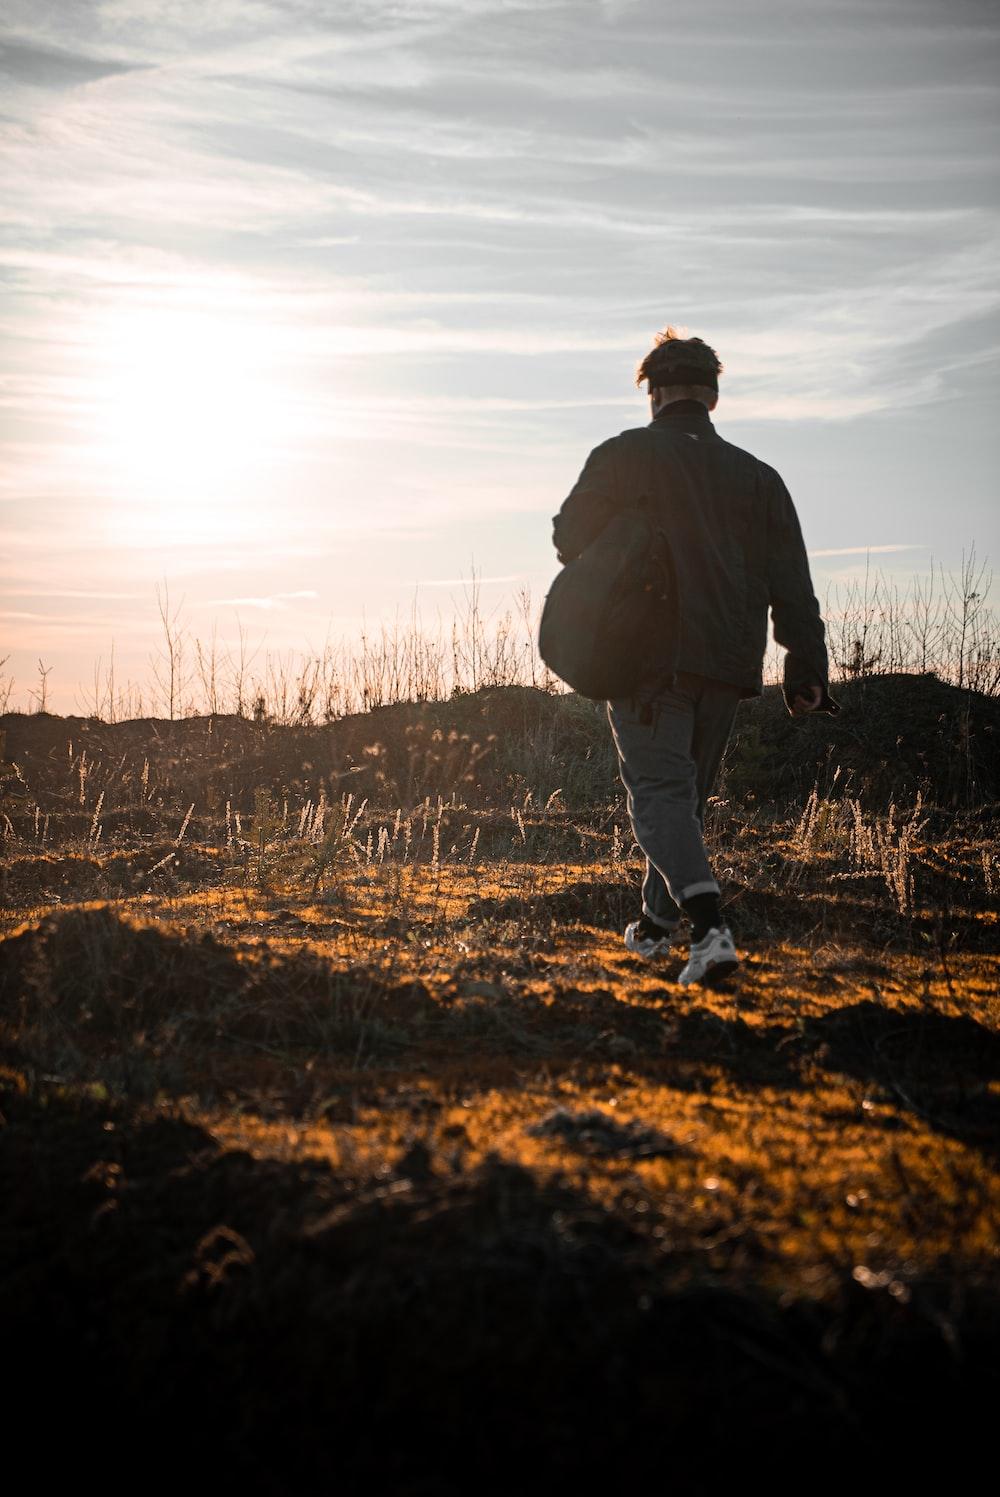 man in black jacket walking on brown grass field during daytime